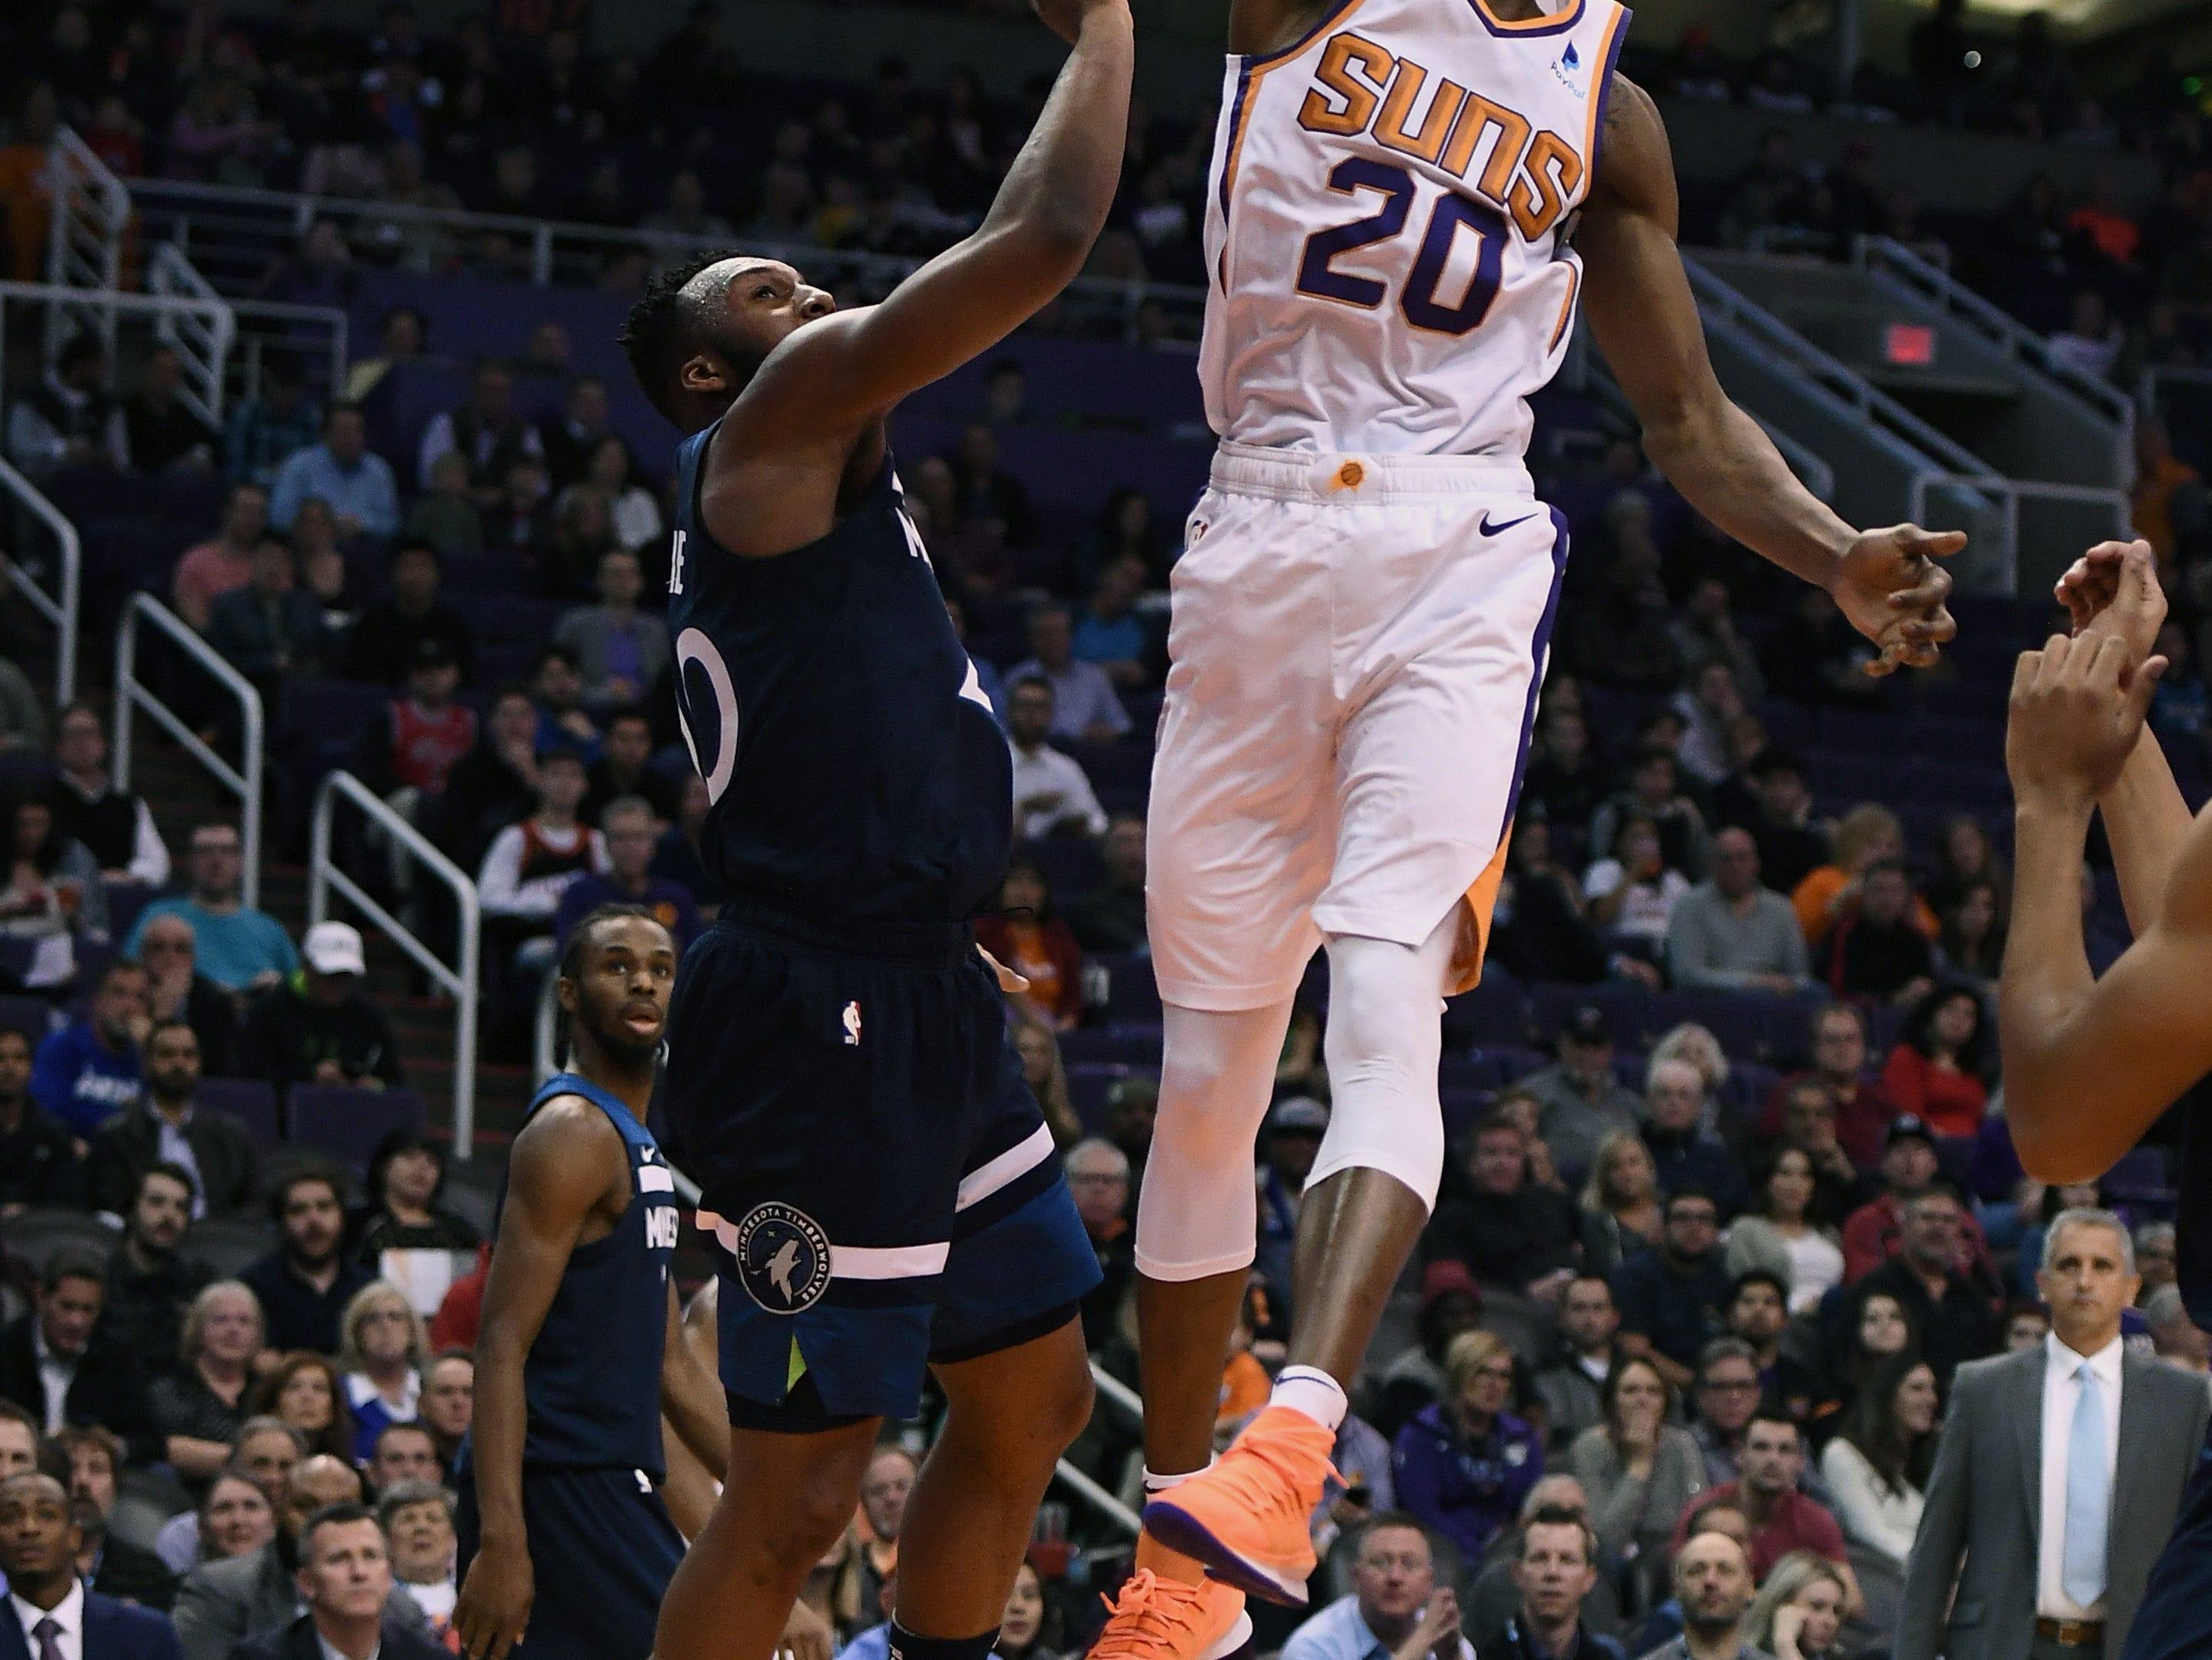 Jan 22, 2019; Phoenix, AZ, USA; Phoenix Suns forward Josh Jackson (20) dunks the ball against the Minnesota Timberwolves in the first half at Talking Stick Resort Arena. Mandatory Credit: Jennifer Stewart-USA TODAY Sports